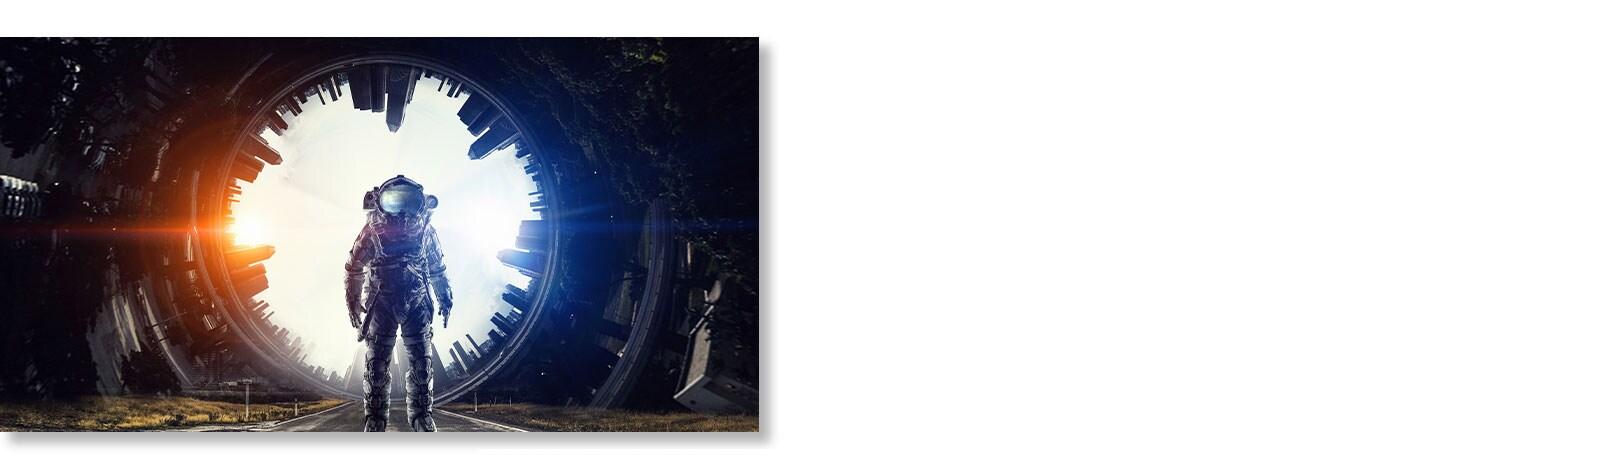 OLEDC9_Dolby-Vision-&-Dolbyr_03_04_2019_D